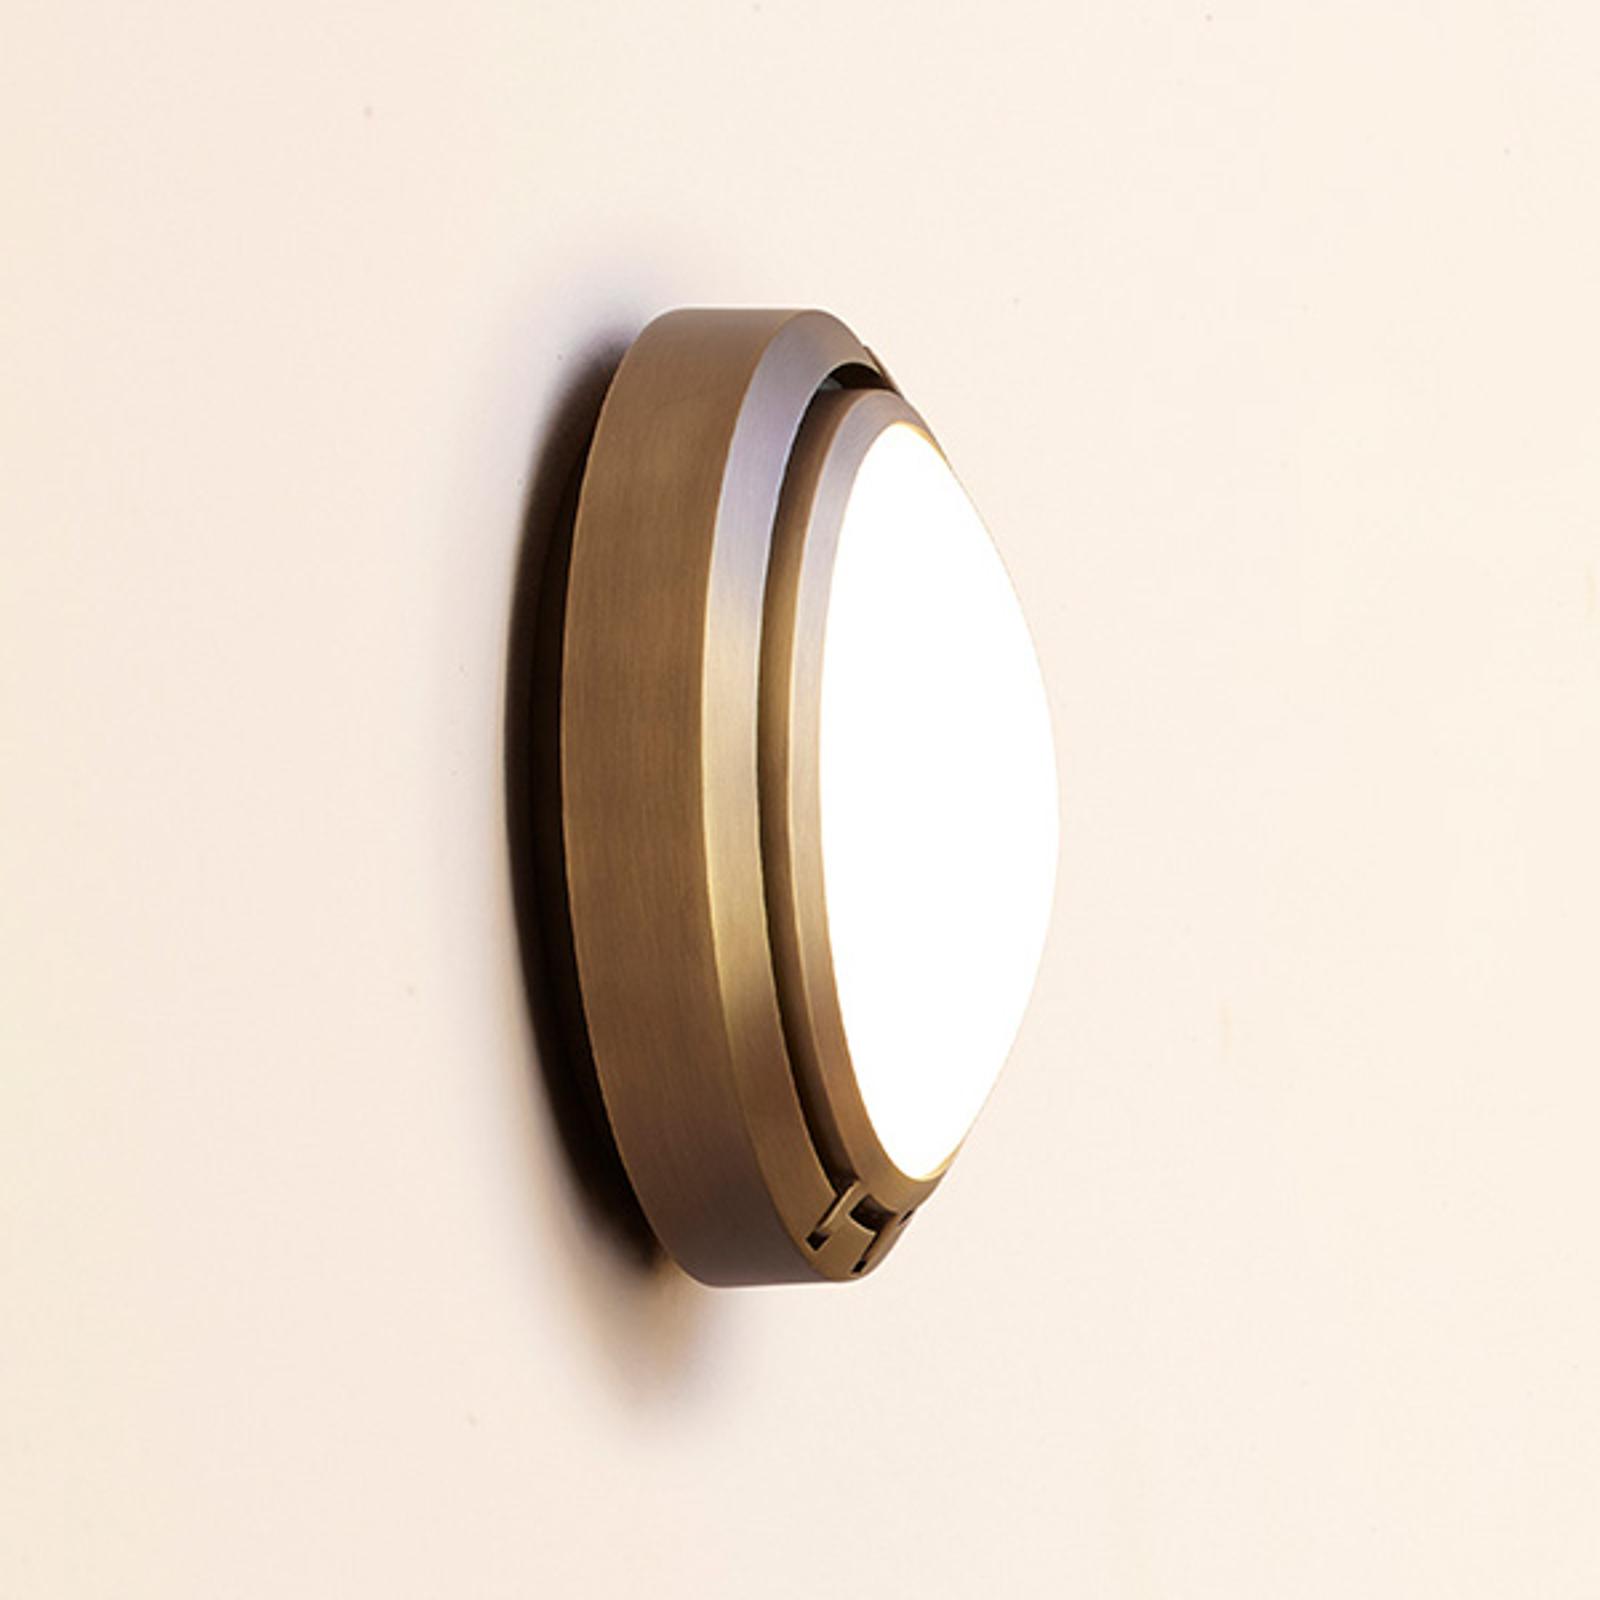 Luceplan Metropoli applique bronze verre 17cm